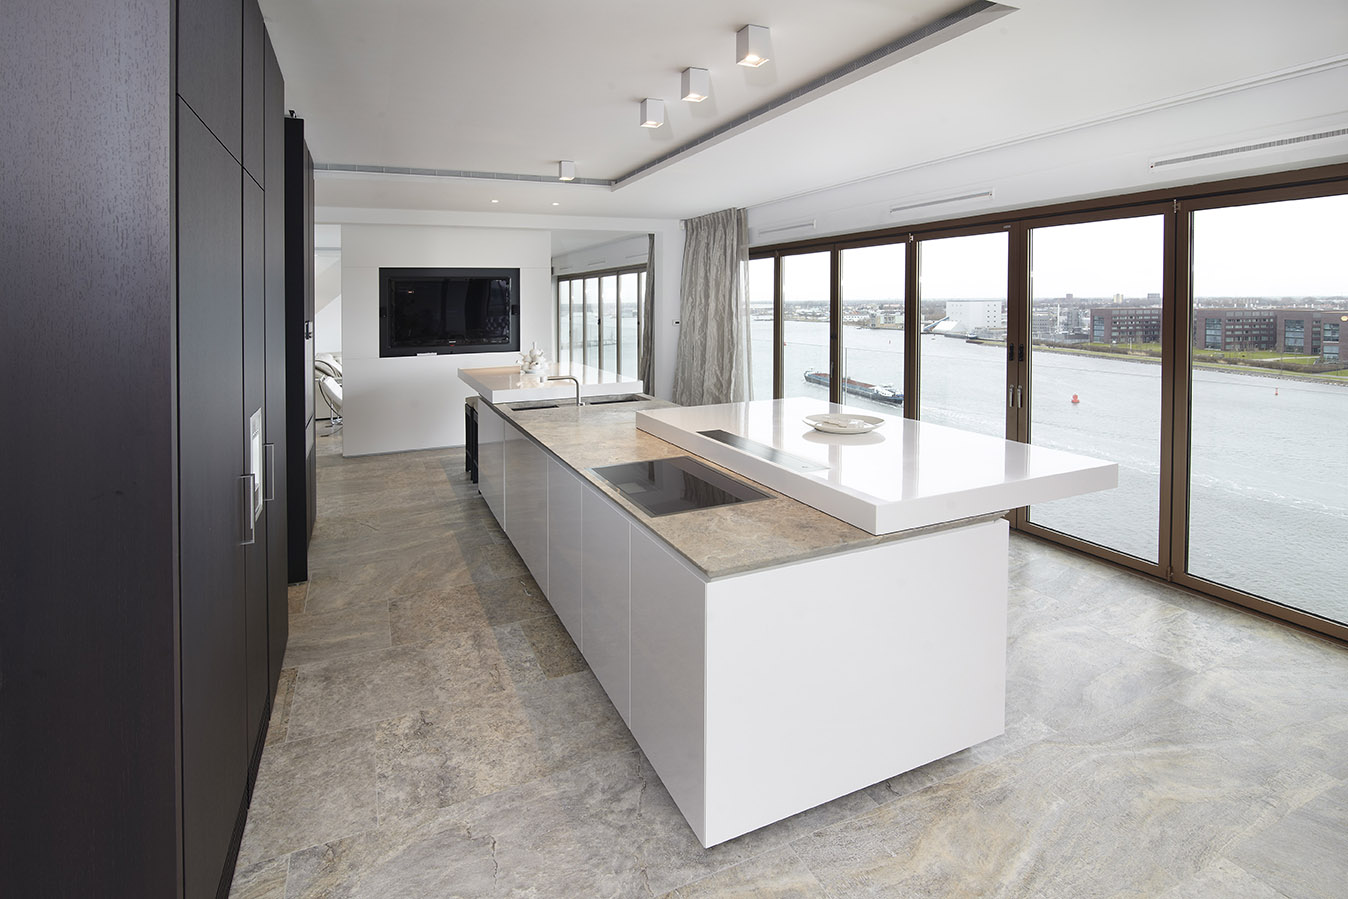 Keukens houtwerk - Keuken met tafel ...